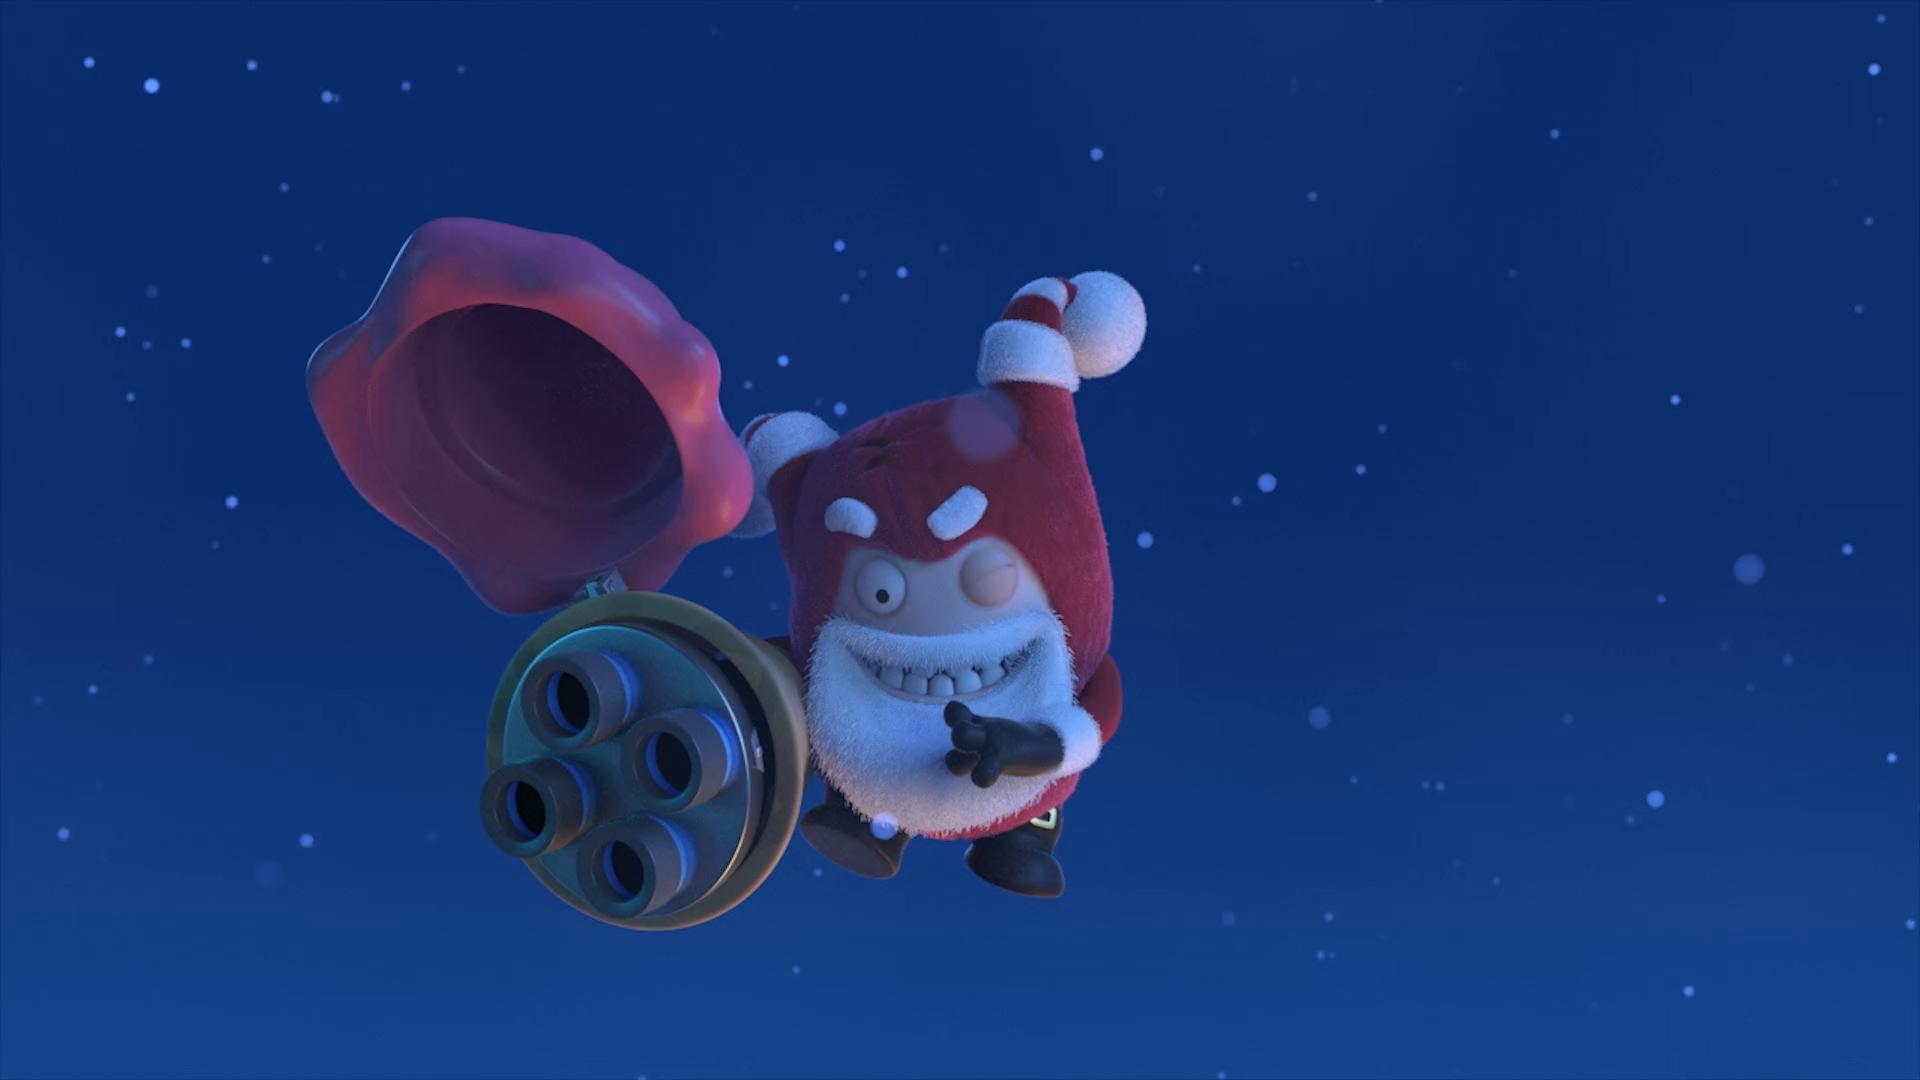 Oddbods - Navidad en Peligro (2018) 1080p WEB-DL